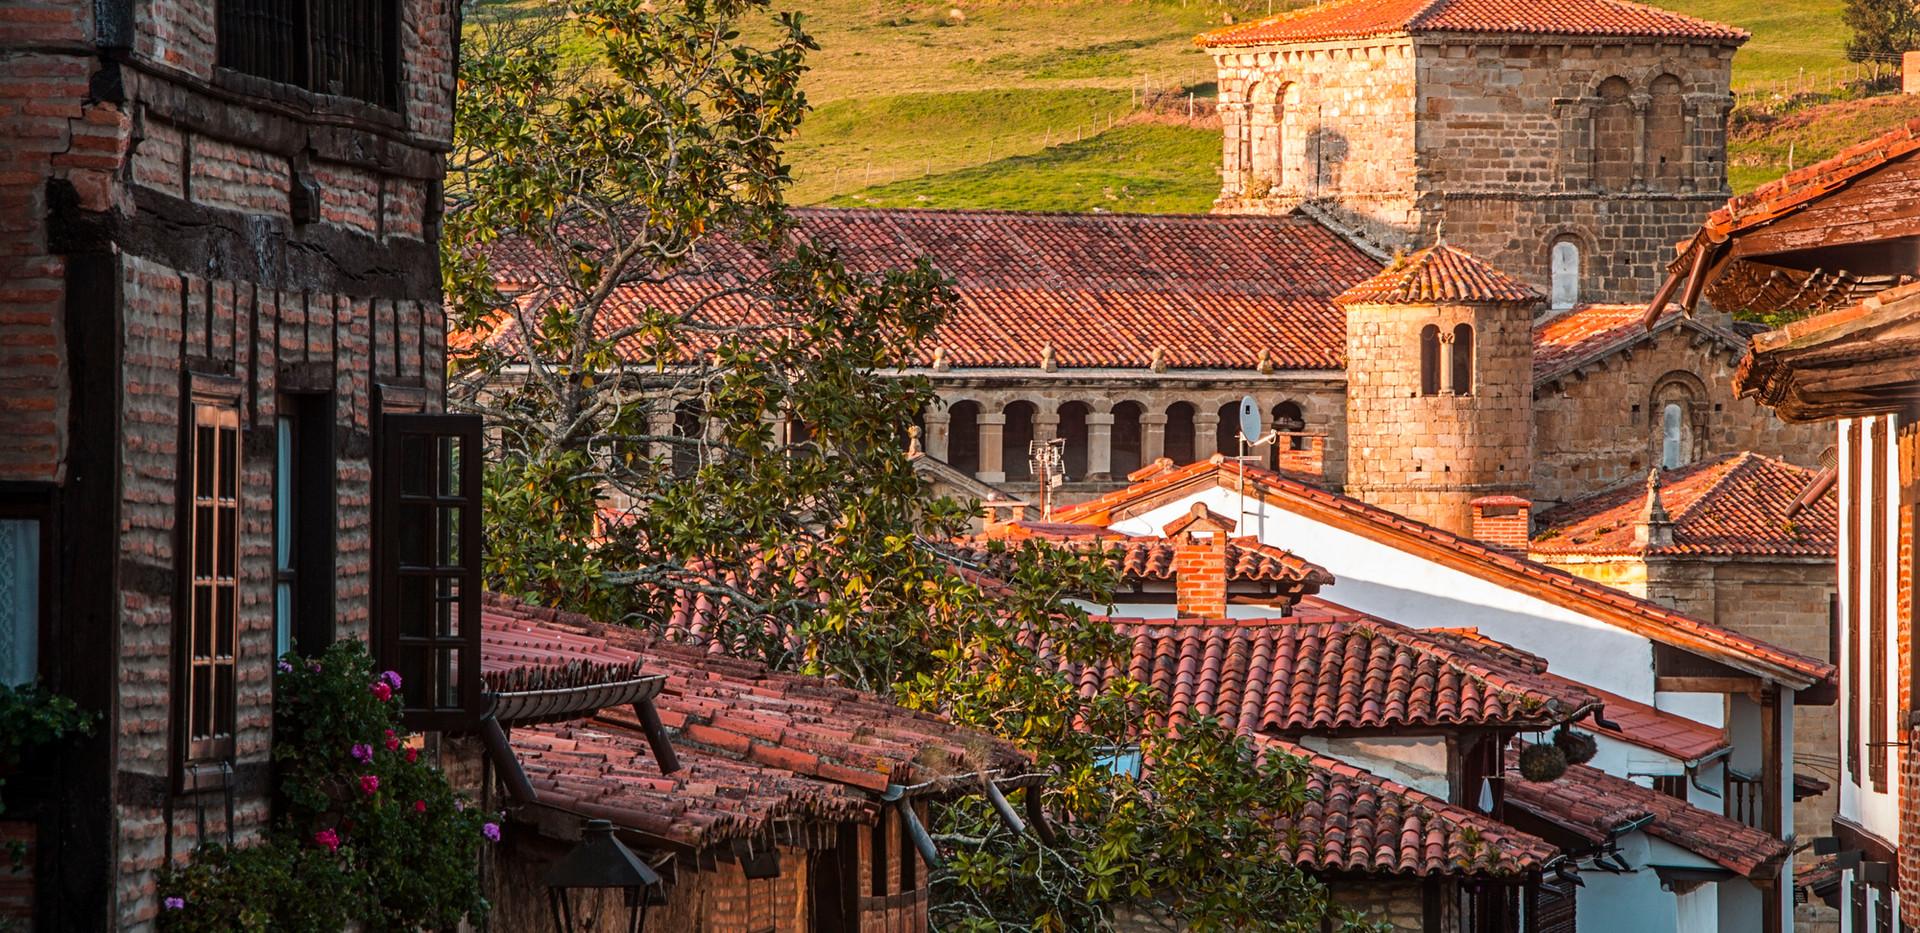 photo tour in Santillana